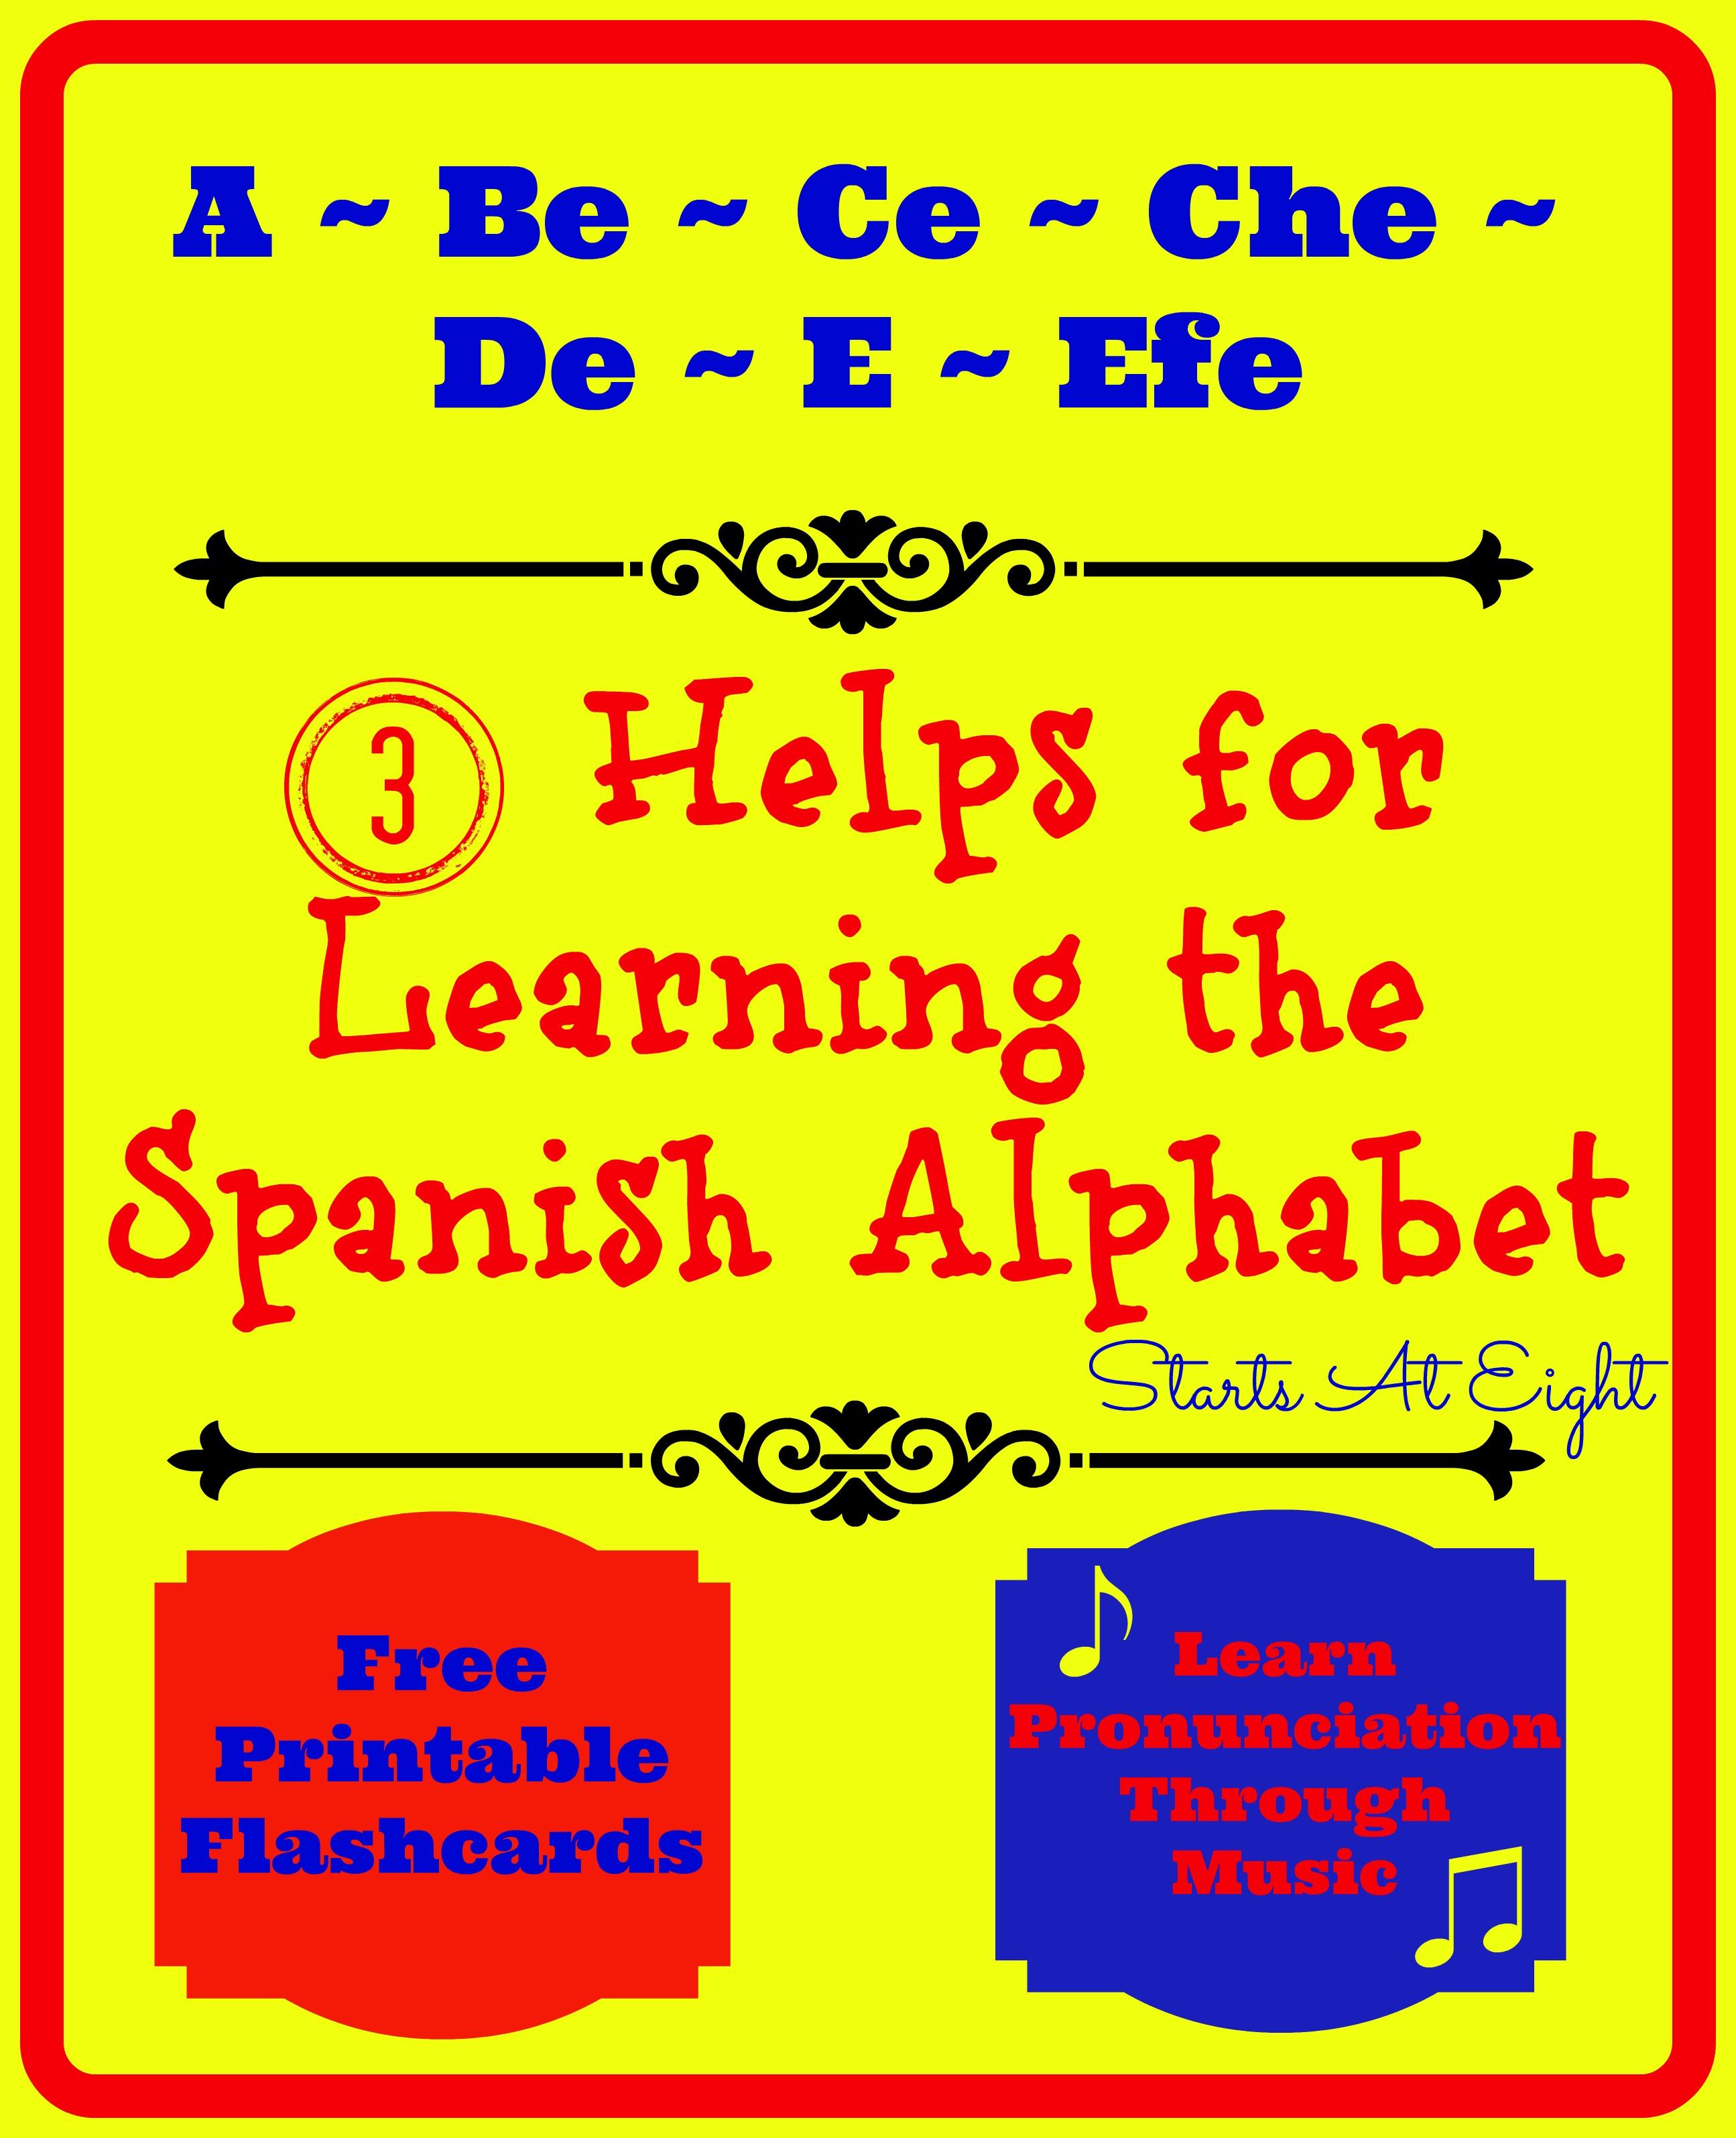 3 Helps For Learning The Spanish Alphabet - Startsateight - Spanish Alphabet Flashcards Free Printable